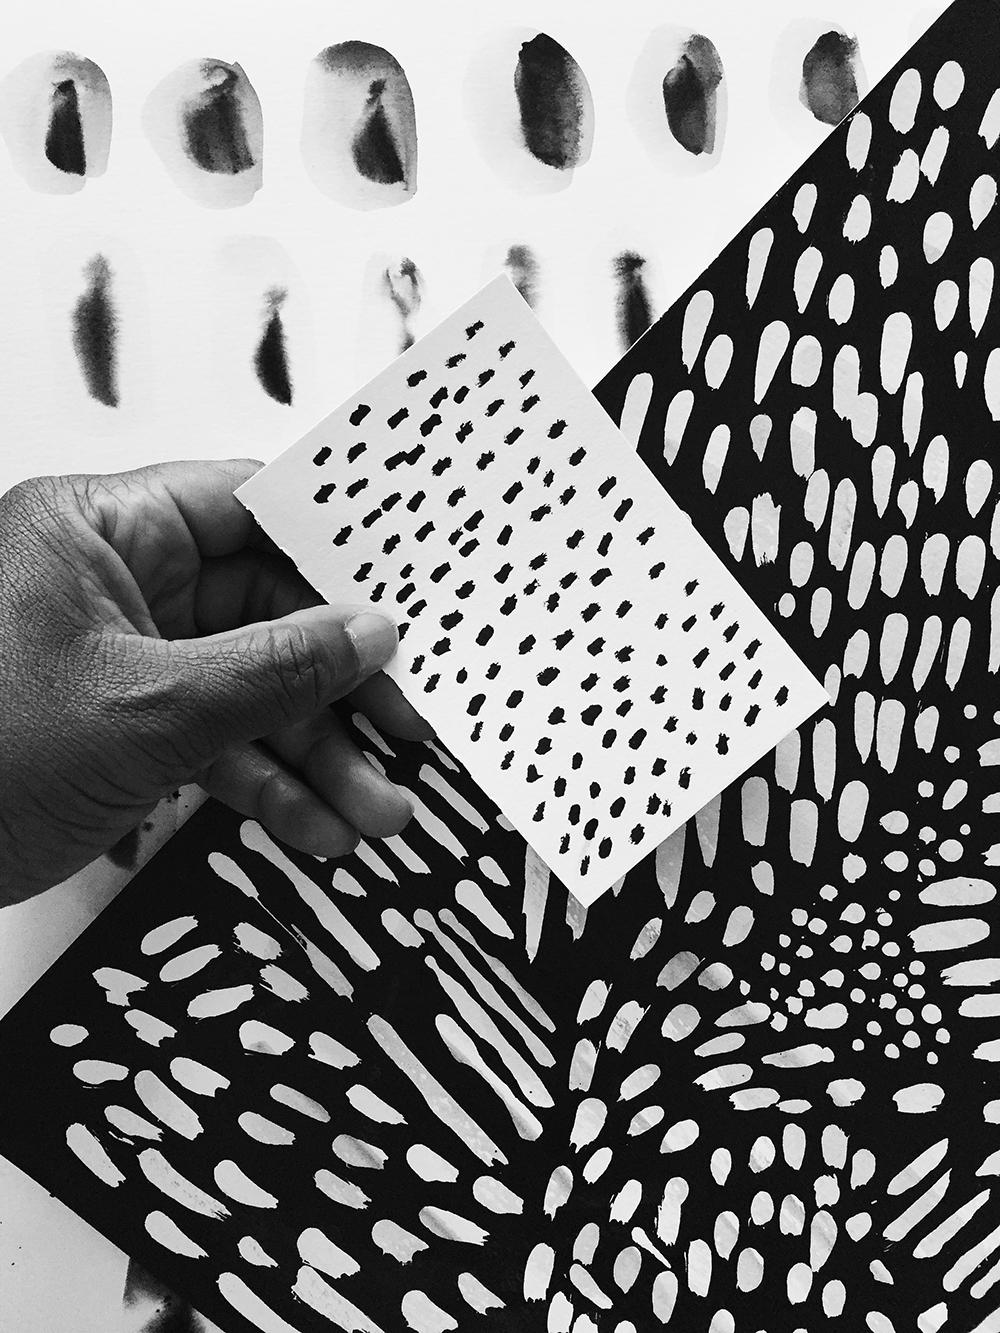 tafui-patternsjpg